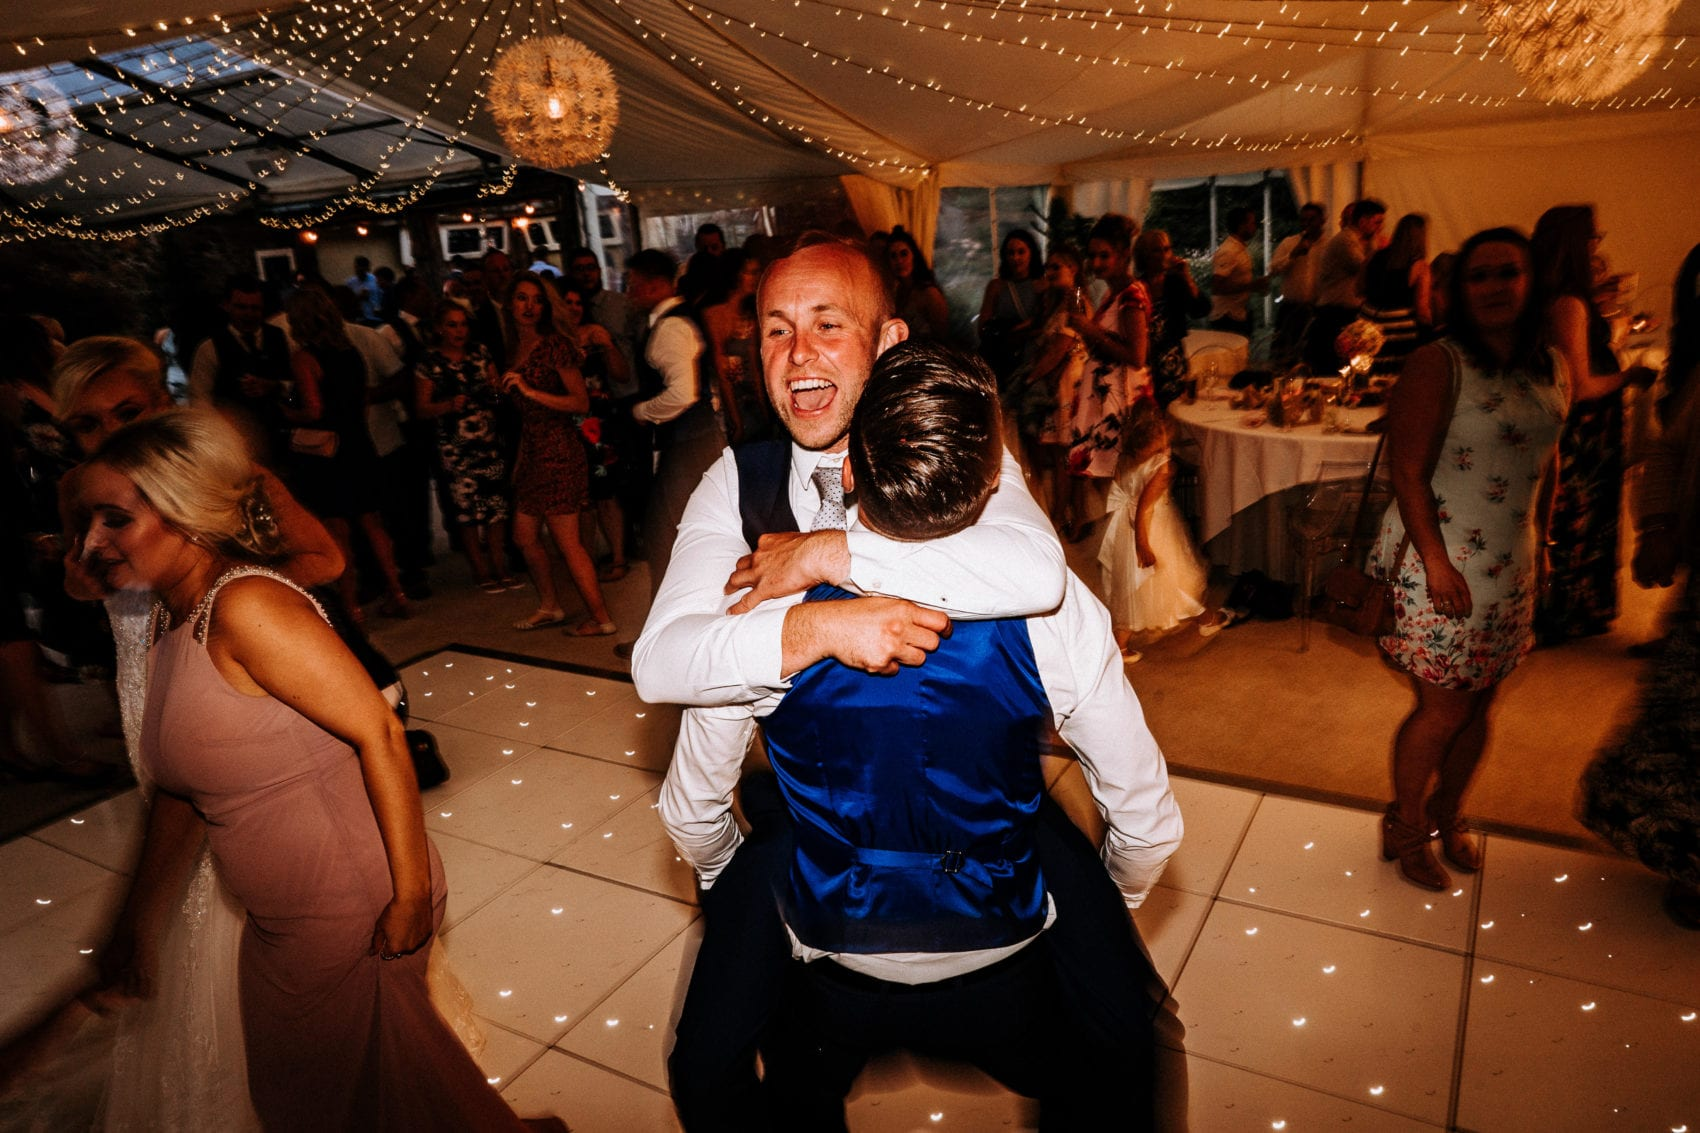 party, best man, groom, reception, dance floor, bromance, ever after, 2019 wedding